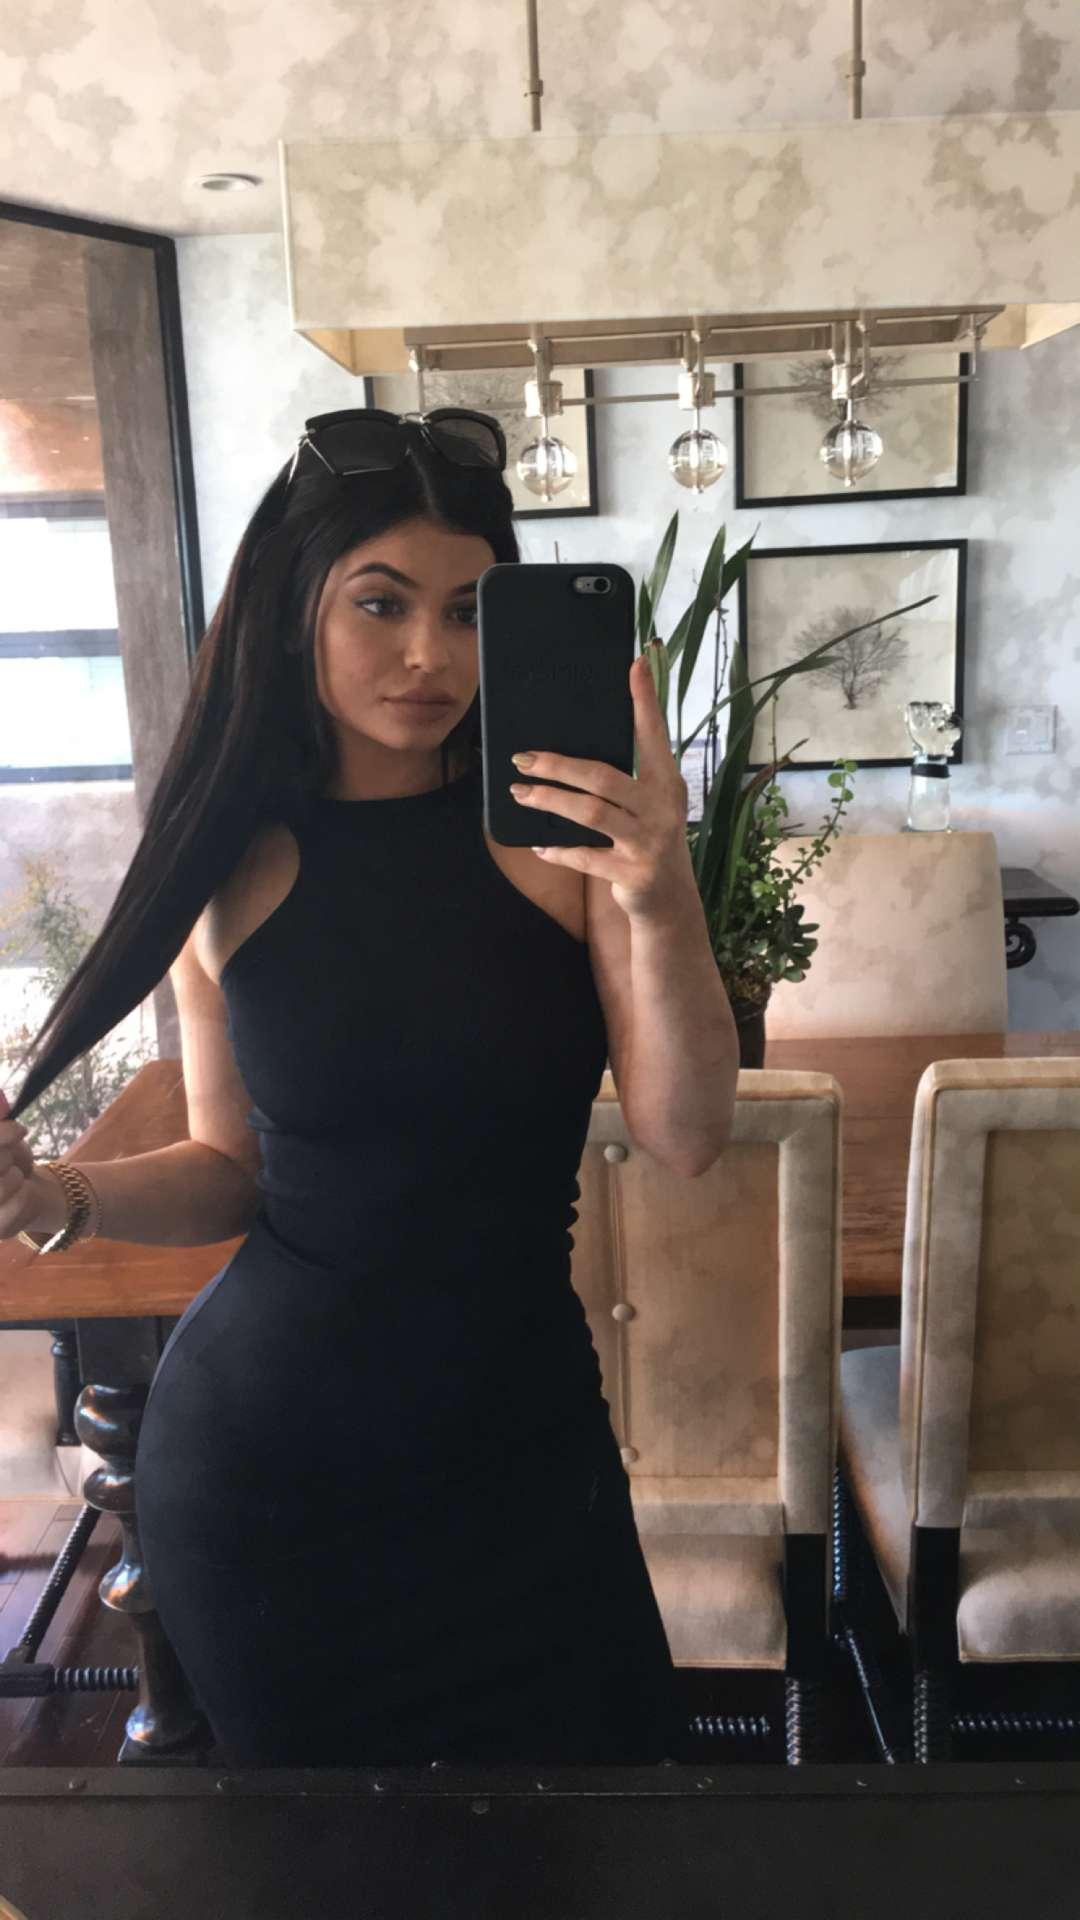 image Kylie jenner sexy snap